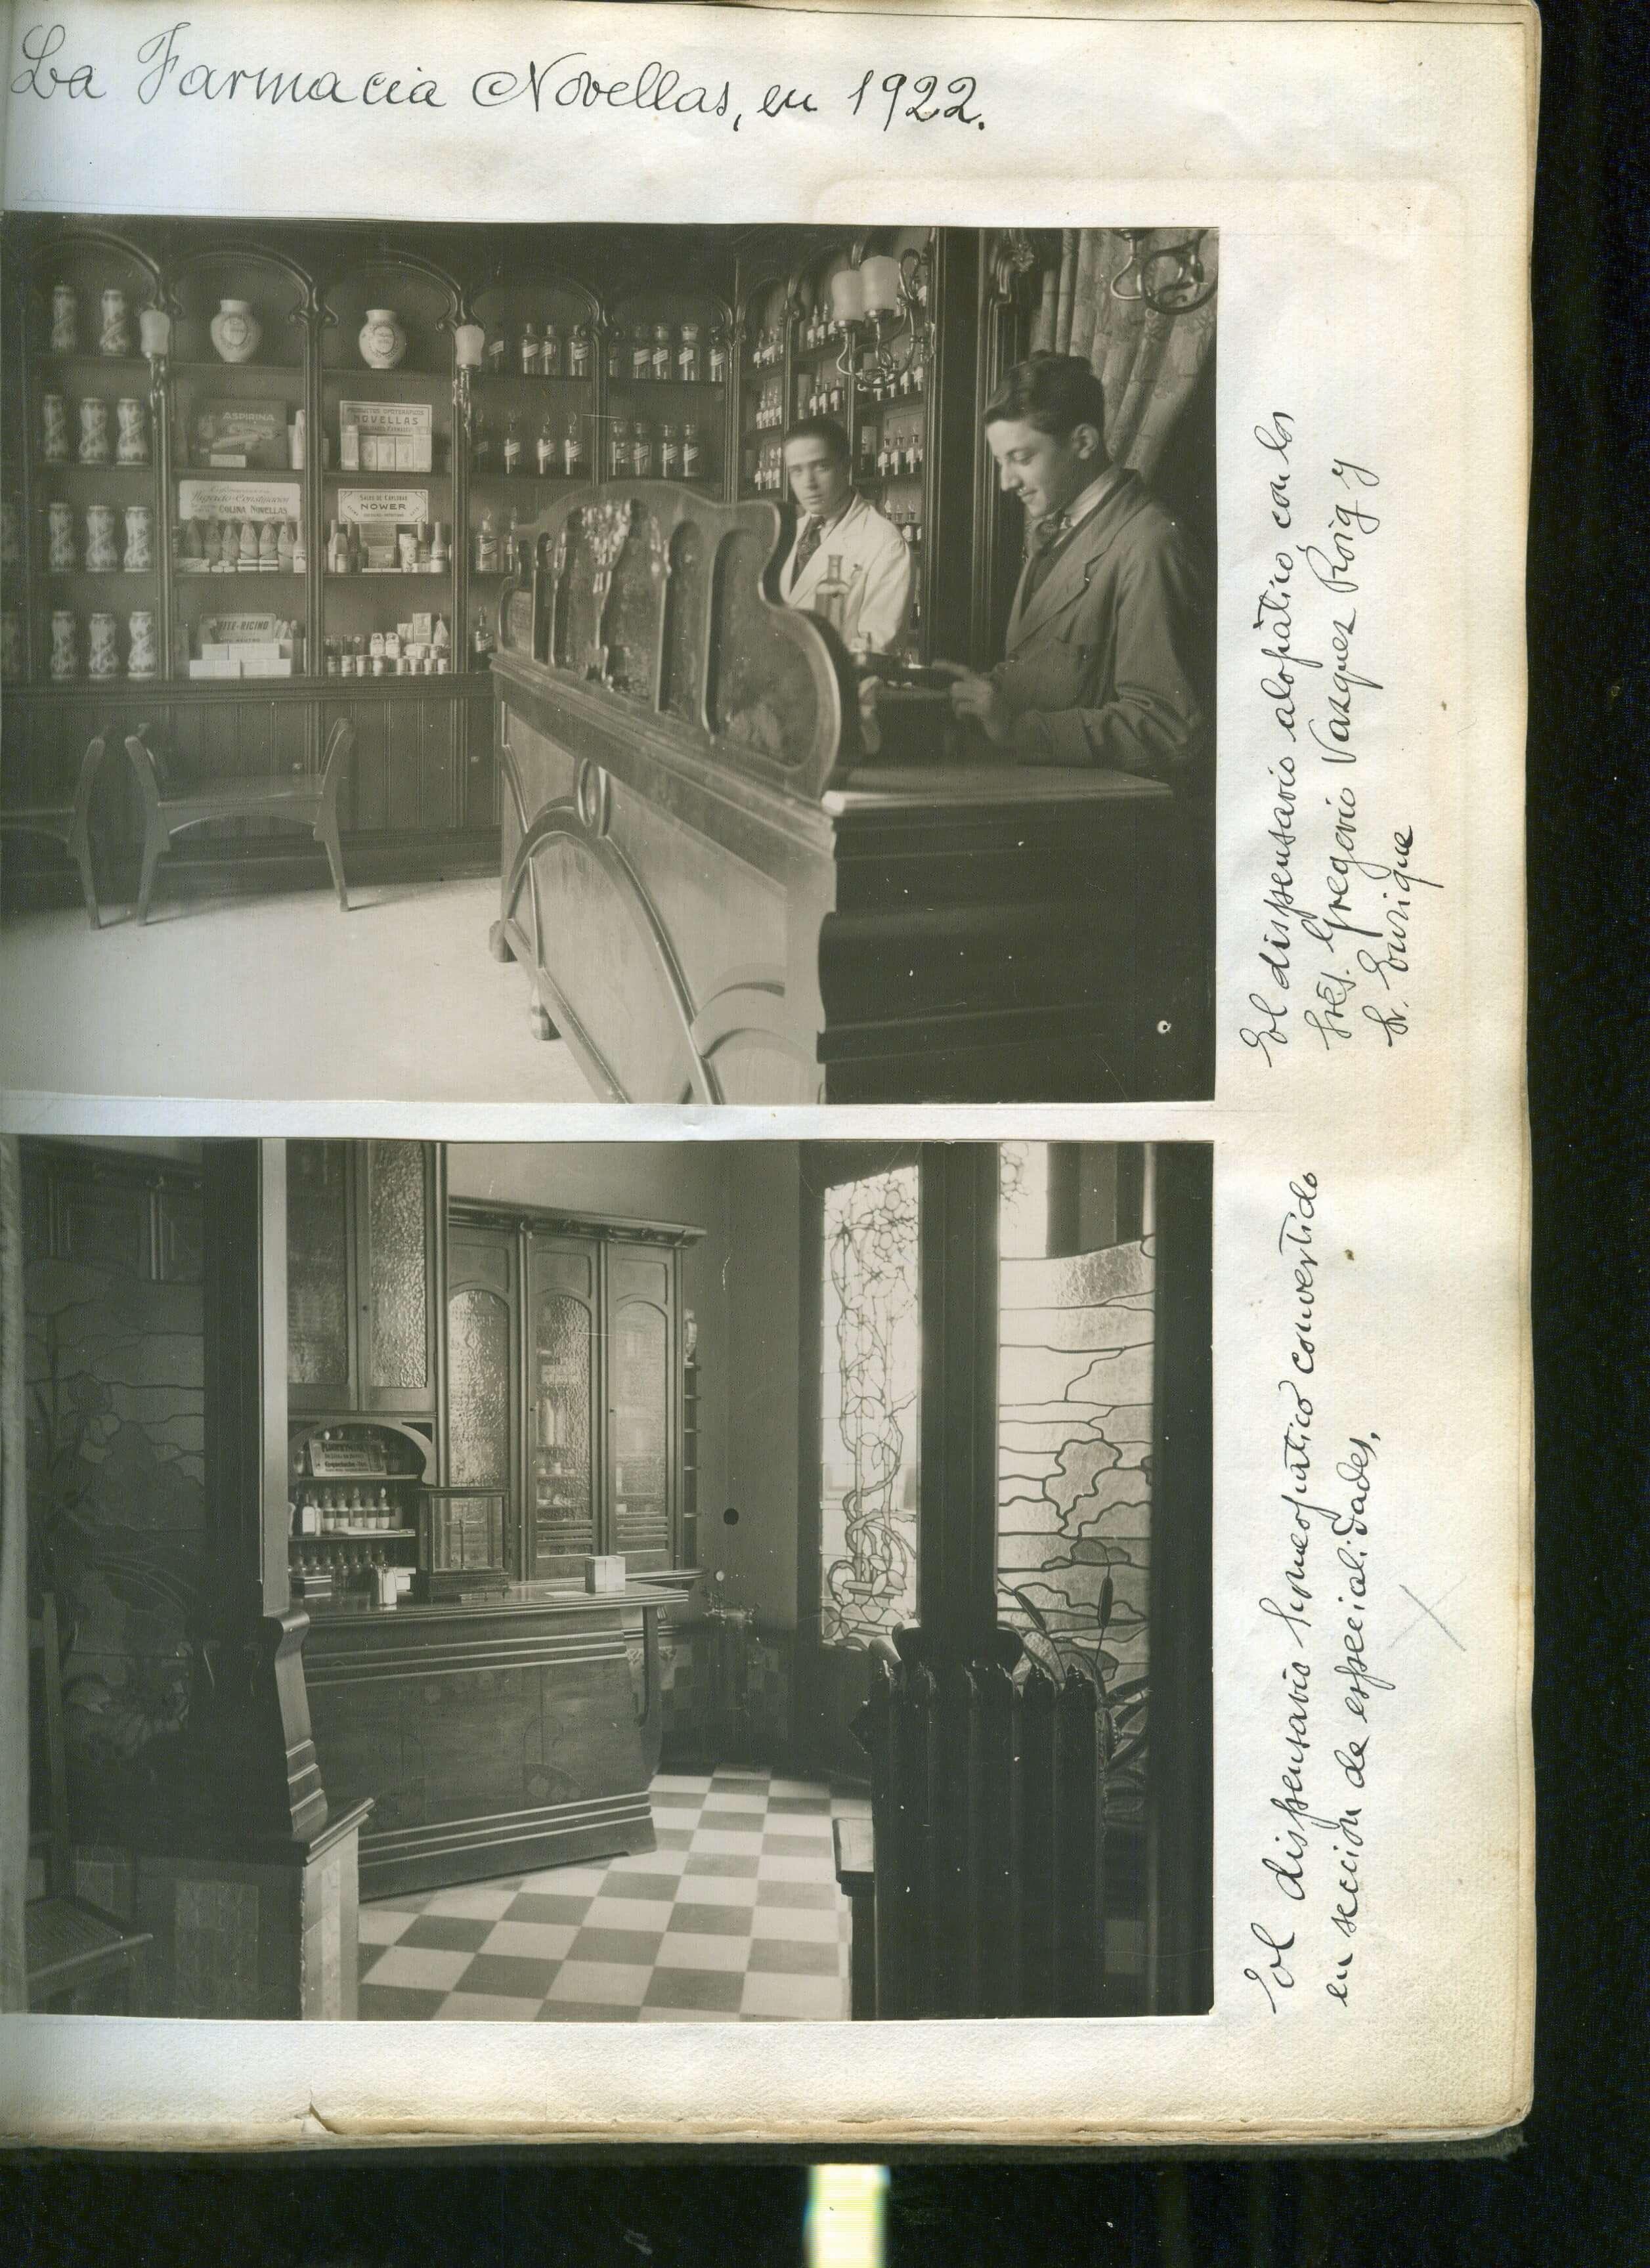 Farmacia Novellas 1922